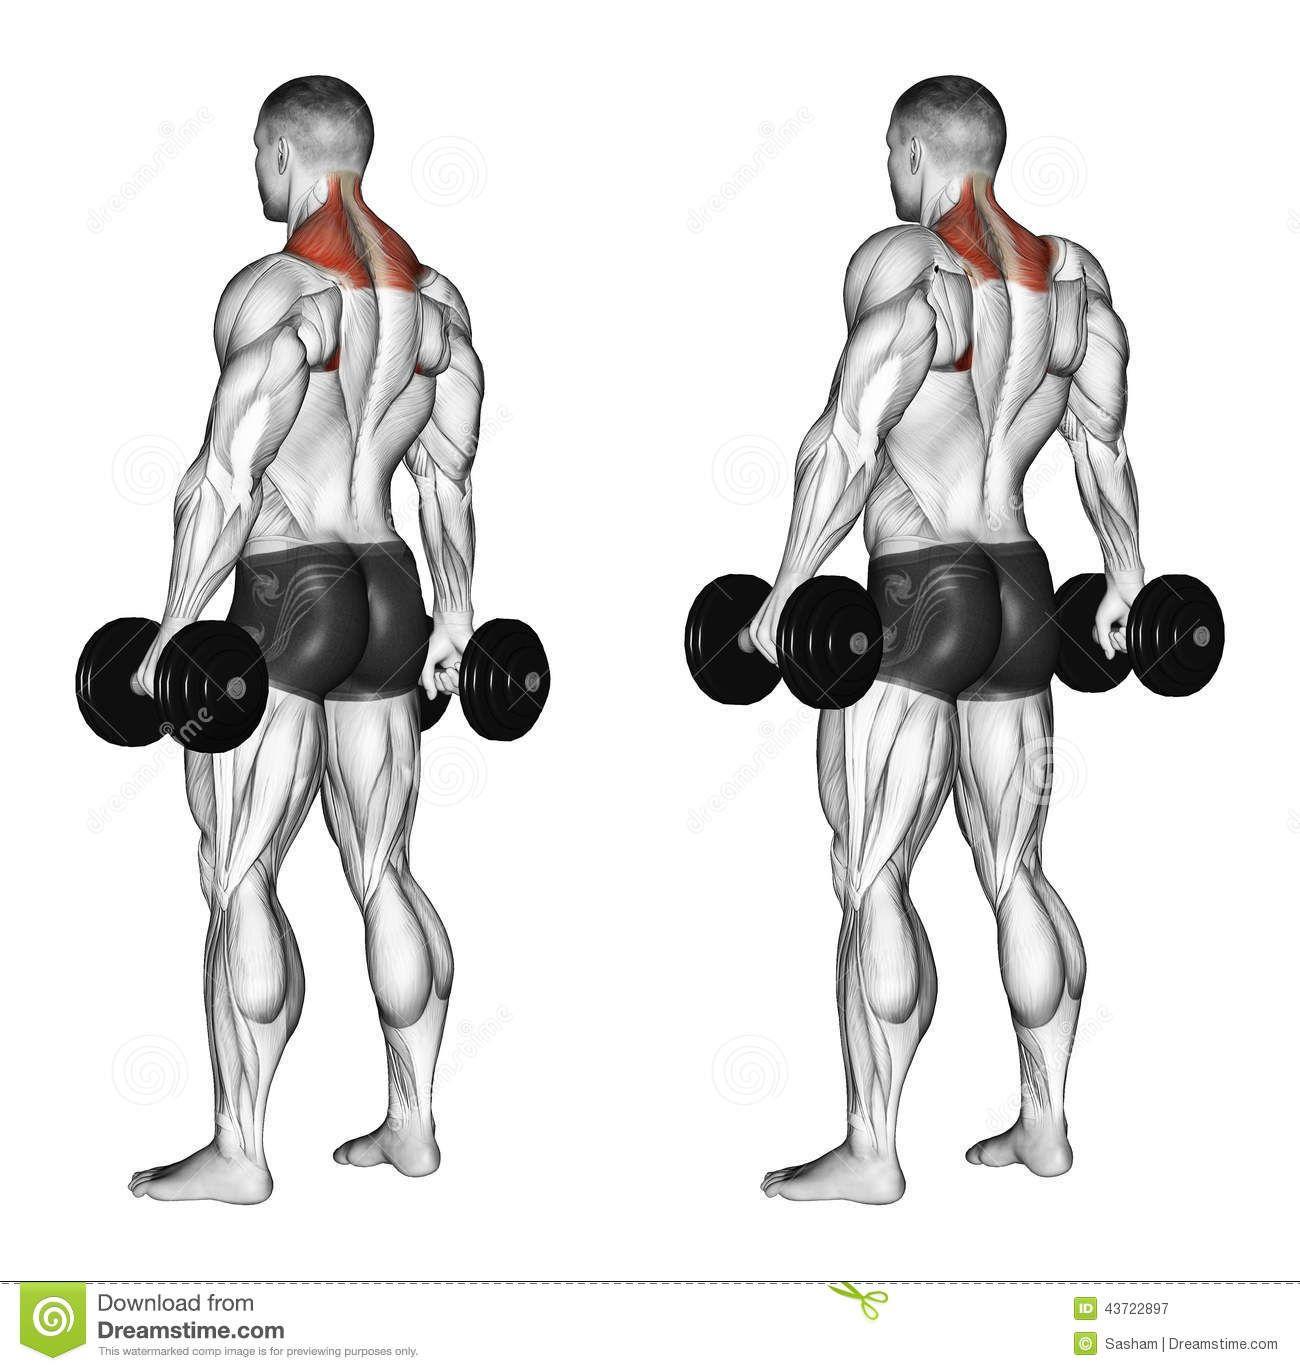 Kettlebell Kickboxingkettlebell: Pin By Mr Liu On Anatomy